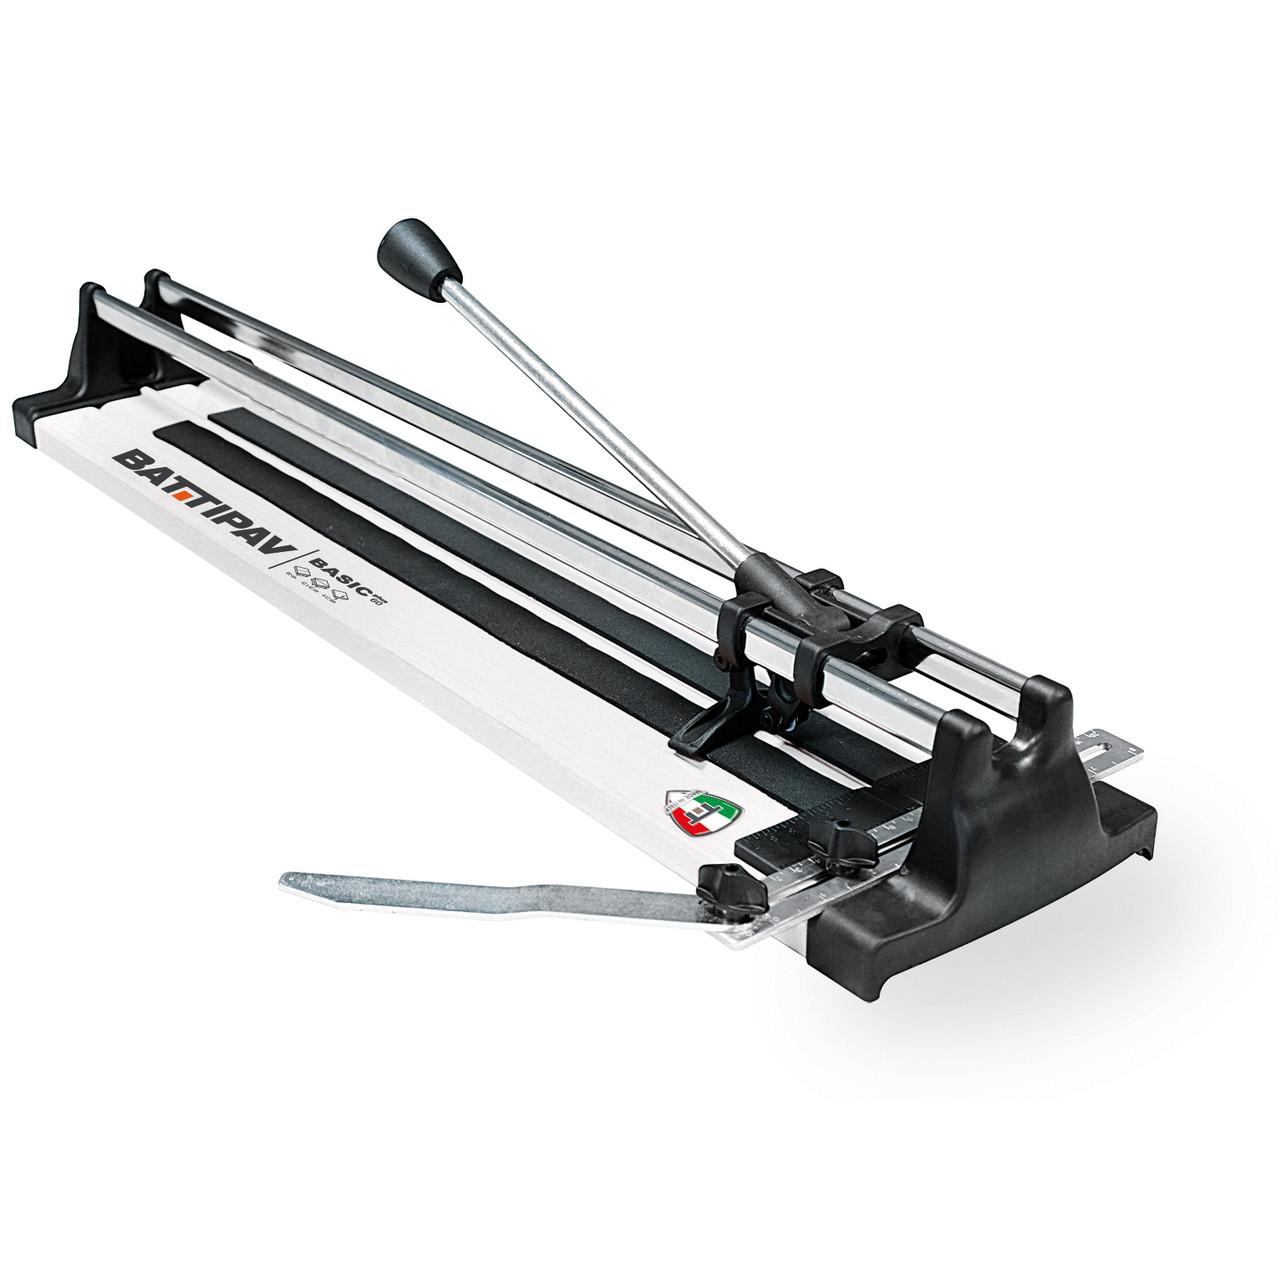 Battipav Basic Plus 600mm Manual Tile Cutter 2060